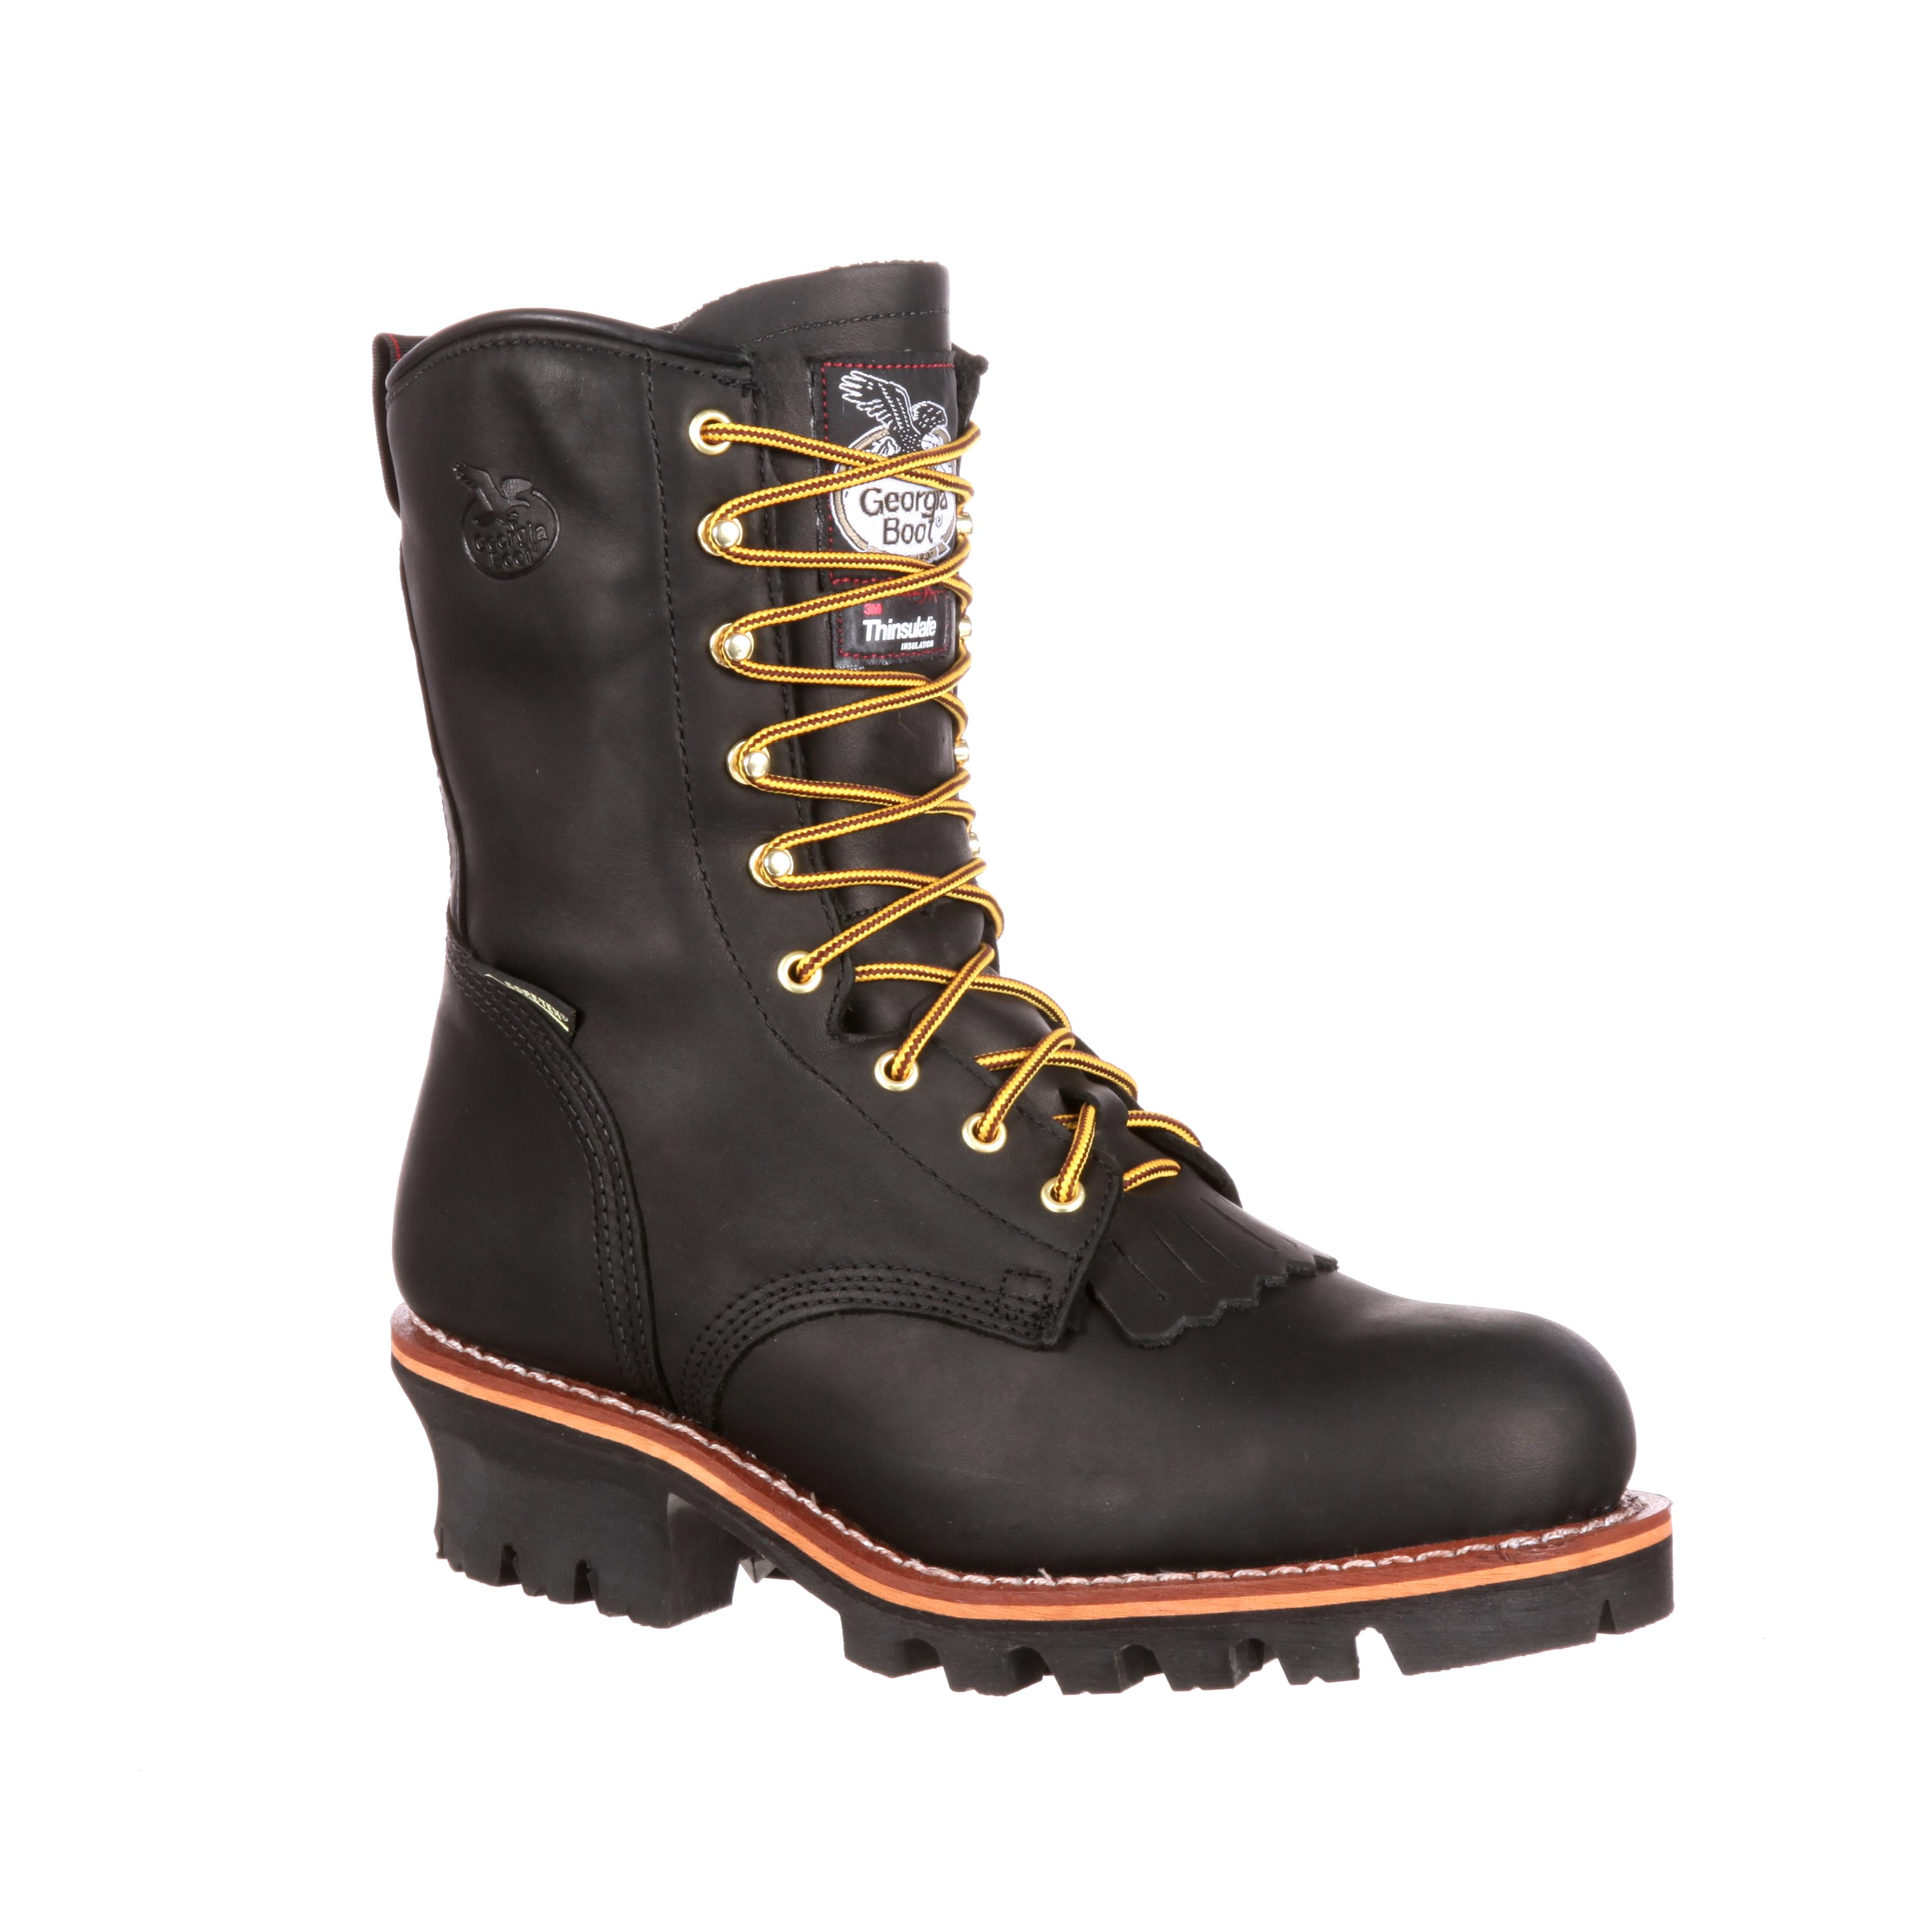 bb50bea7fd8 Georgia GORE-TEX® Waterproof Steel Toe Logger Boots